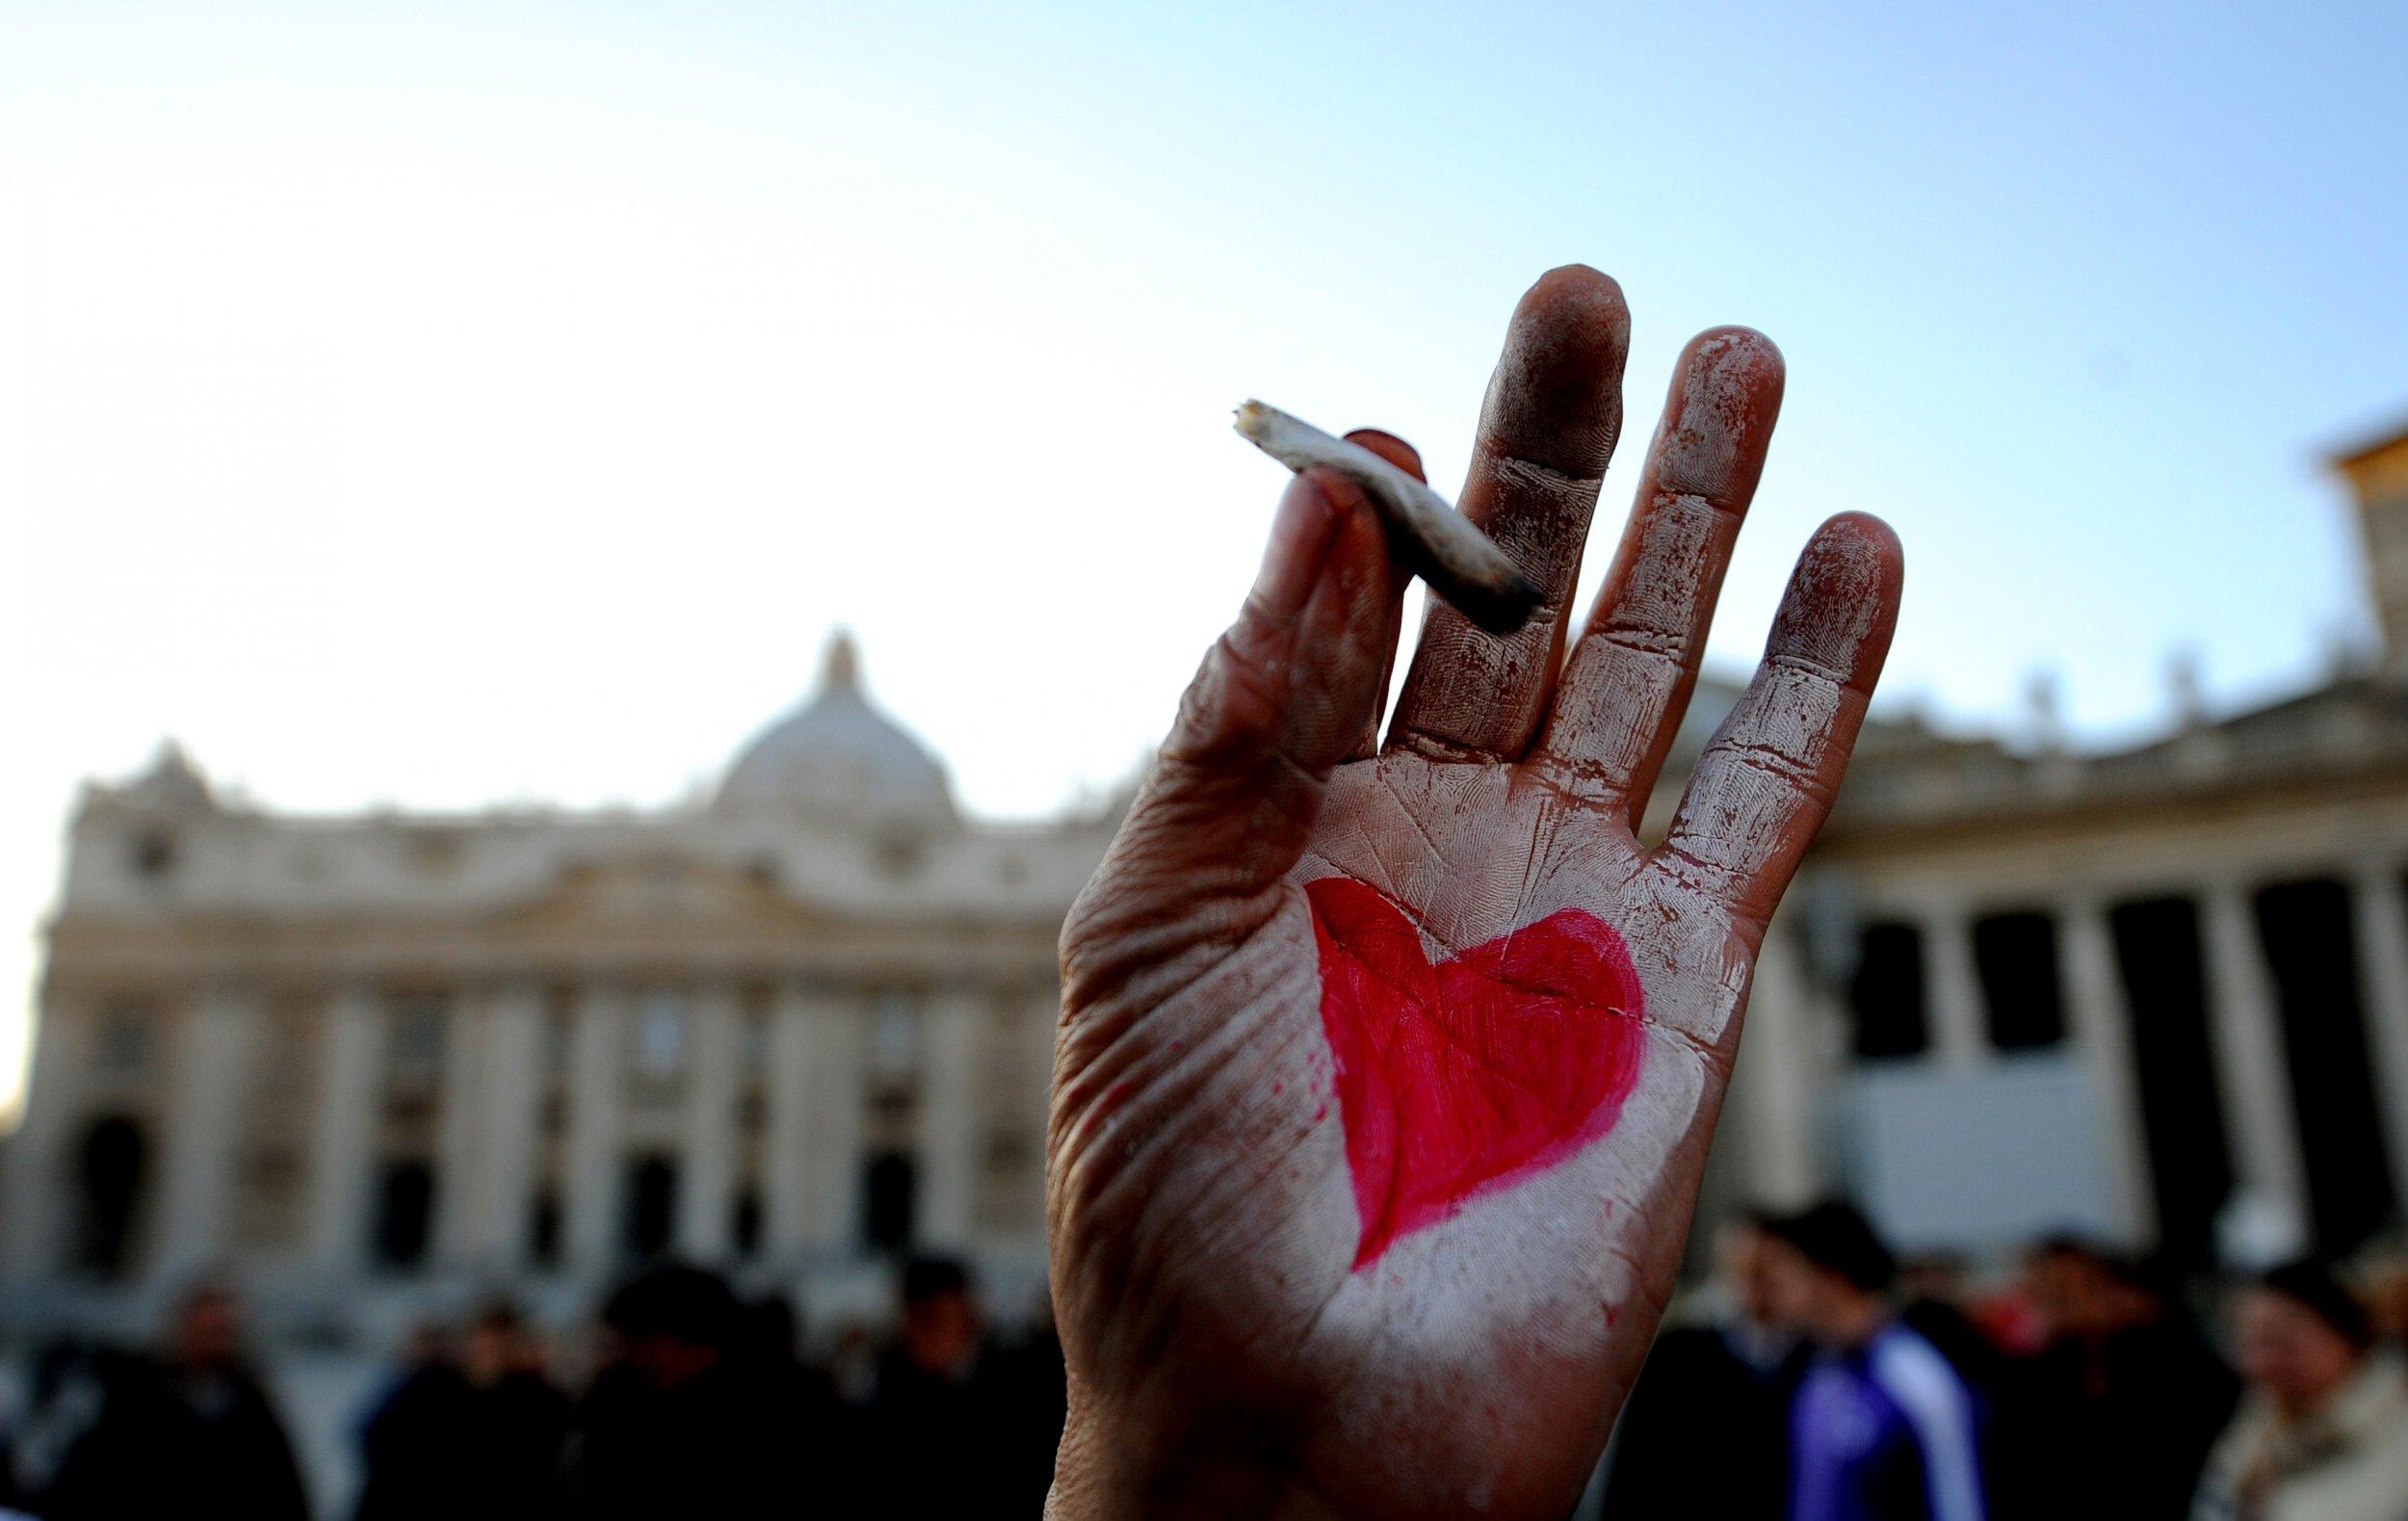 11_09_Vatican_Smoke